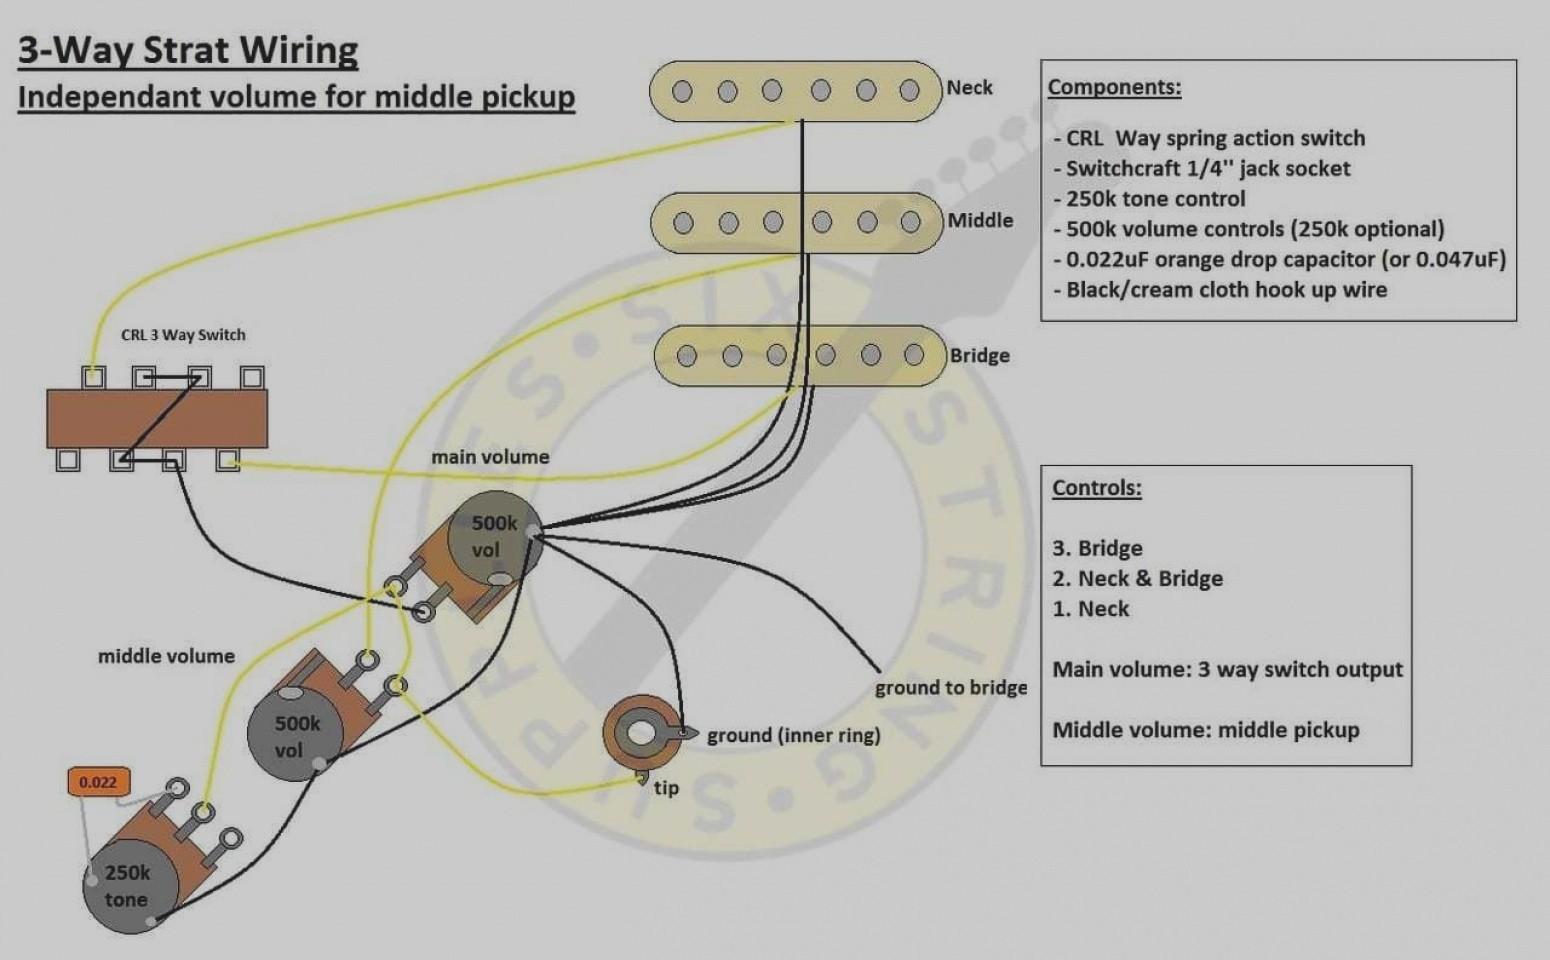 Dz 2394 Wire A 3way Switch Pictures Wiring Diagram